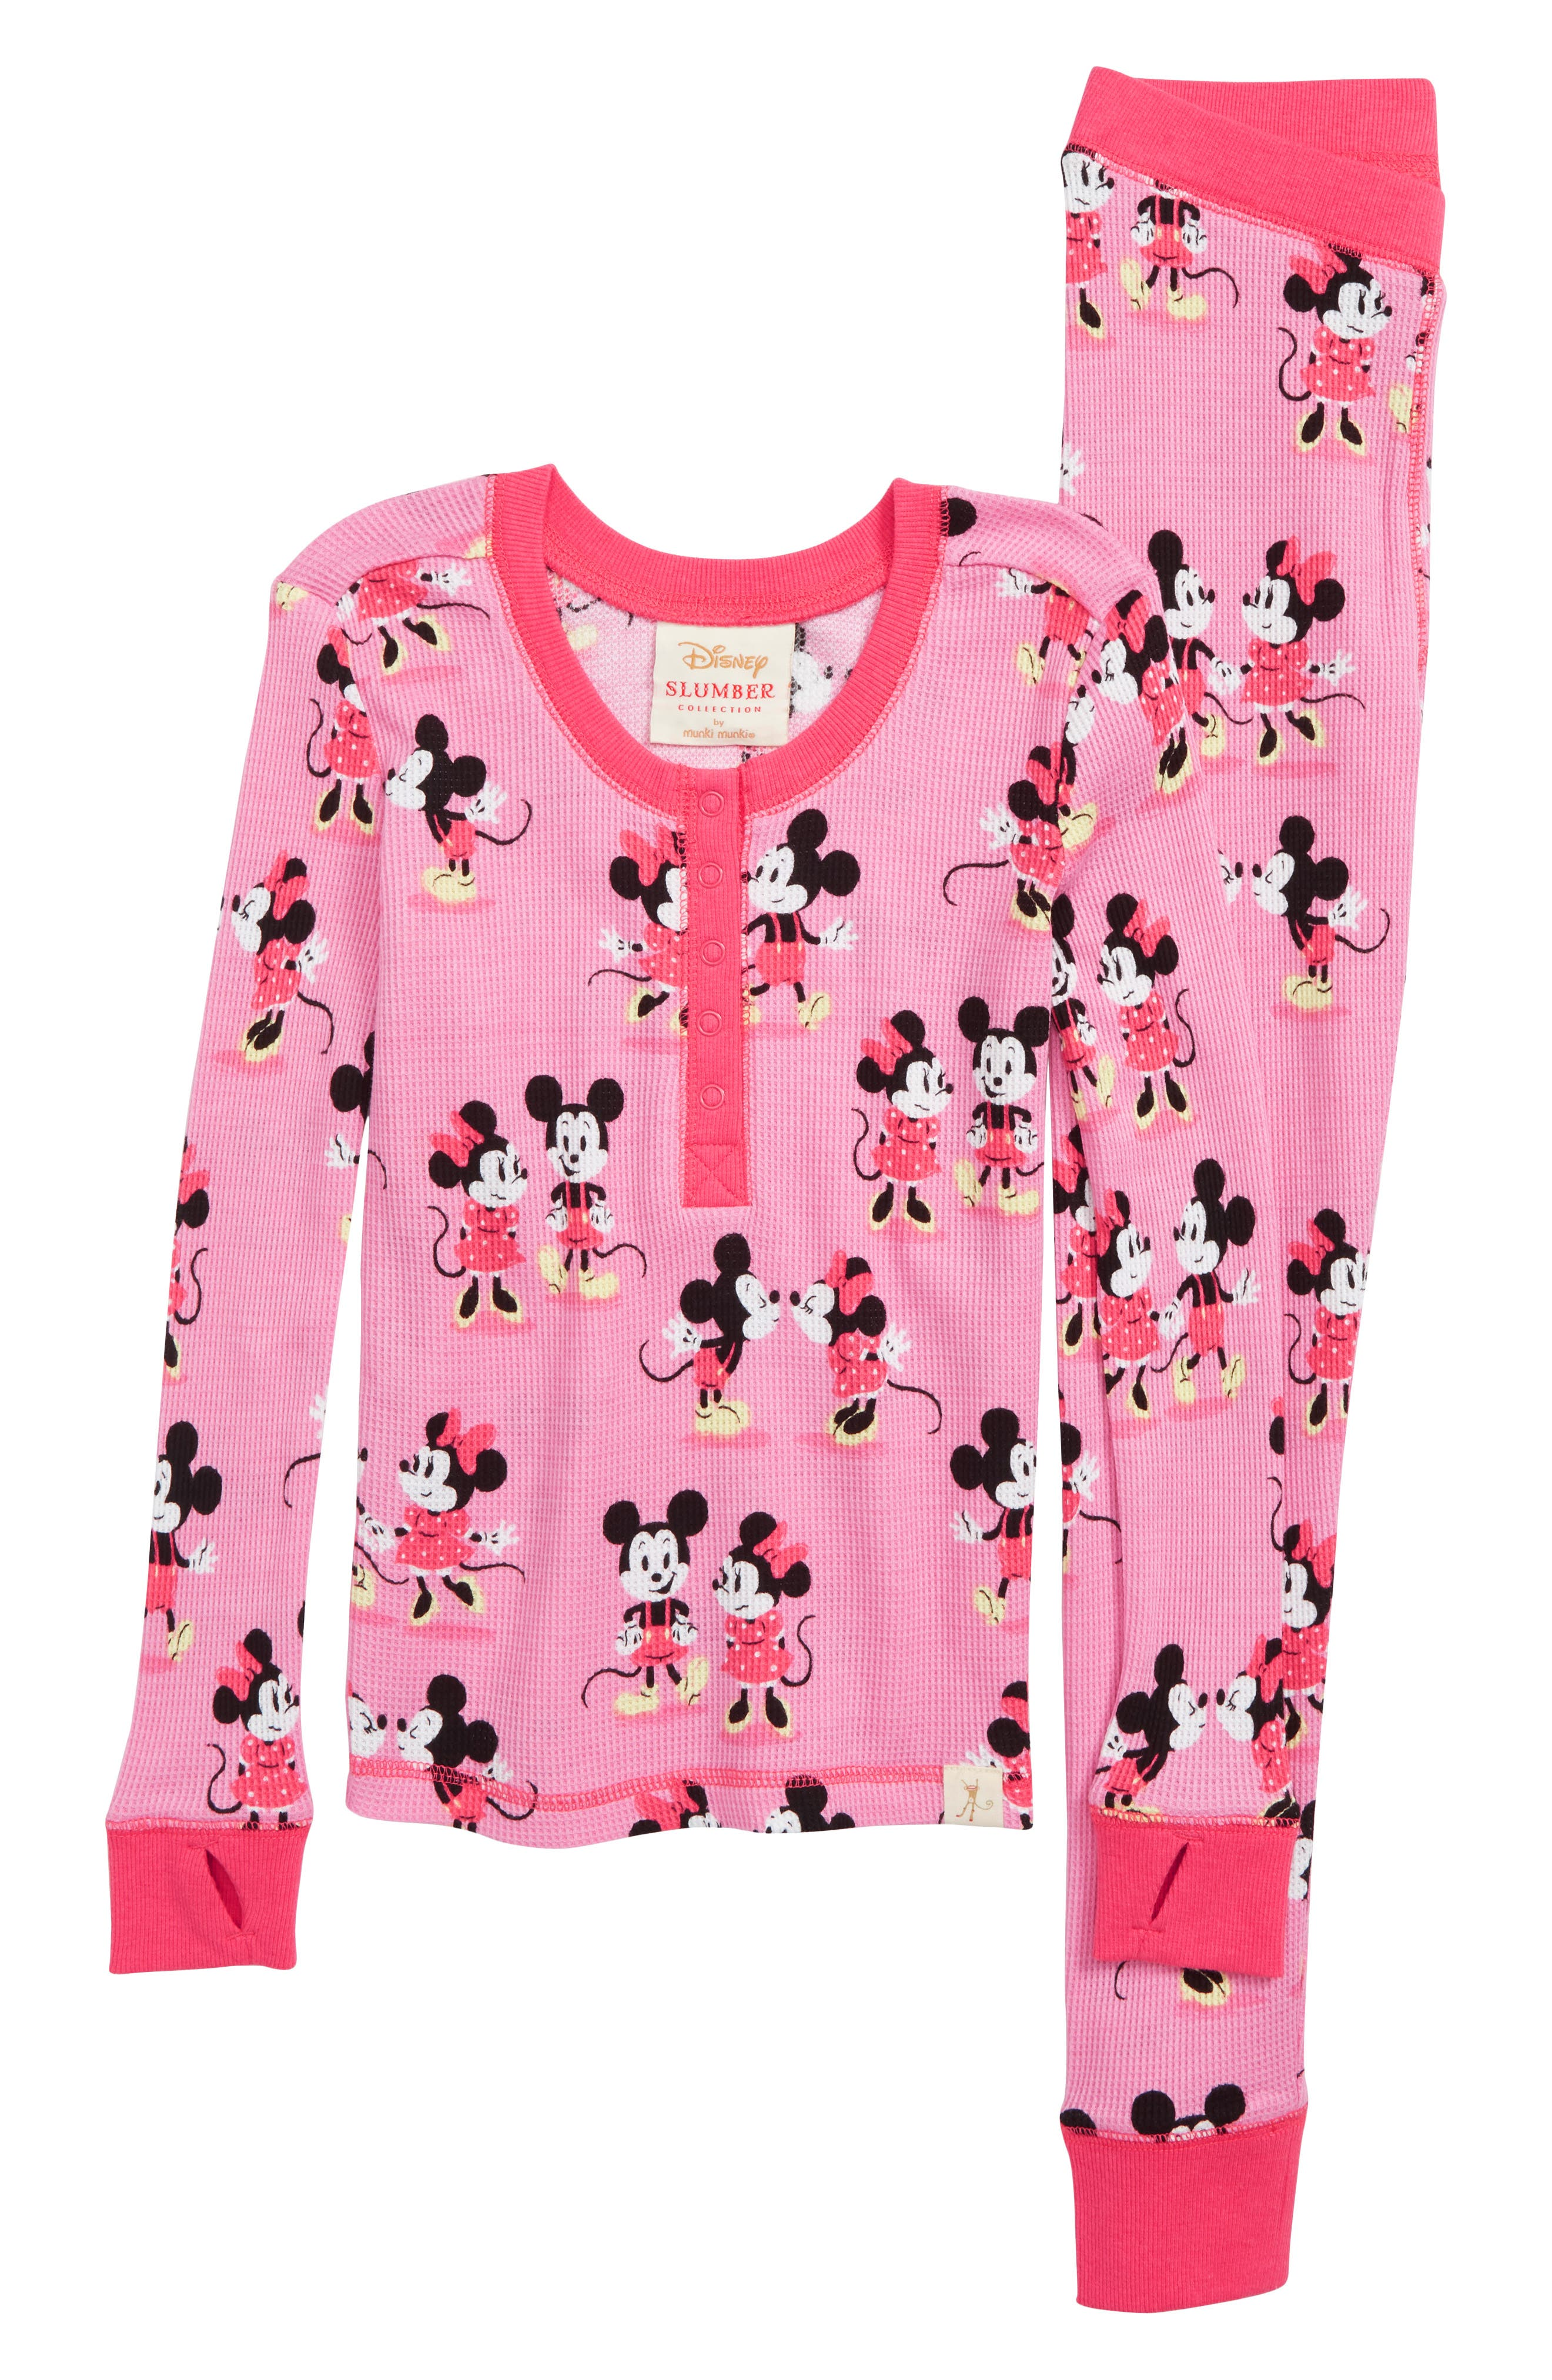 MUNKI MUNKI,                             Minnie Mickey Fitted Two-Piece Pajamas,                             Main thumbnail 1, color,                             650